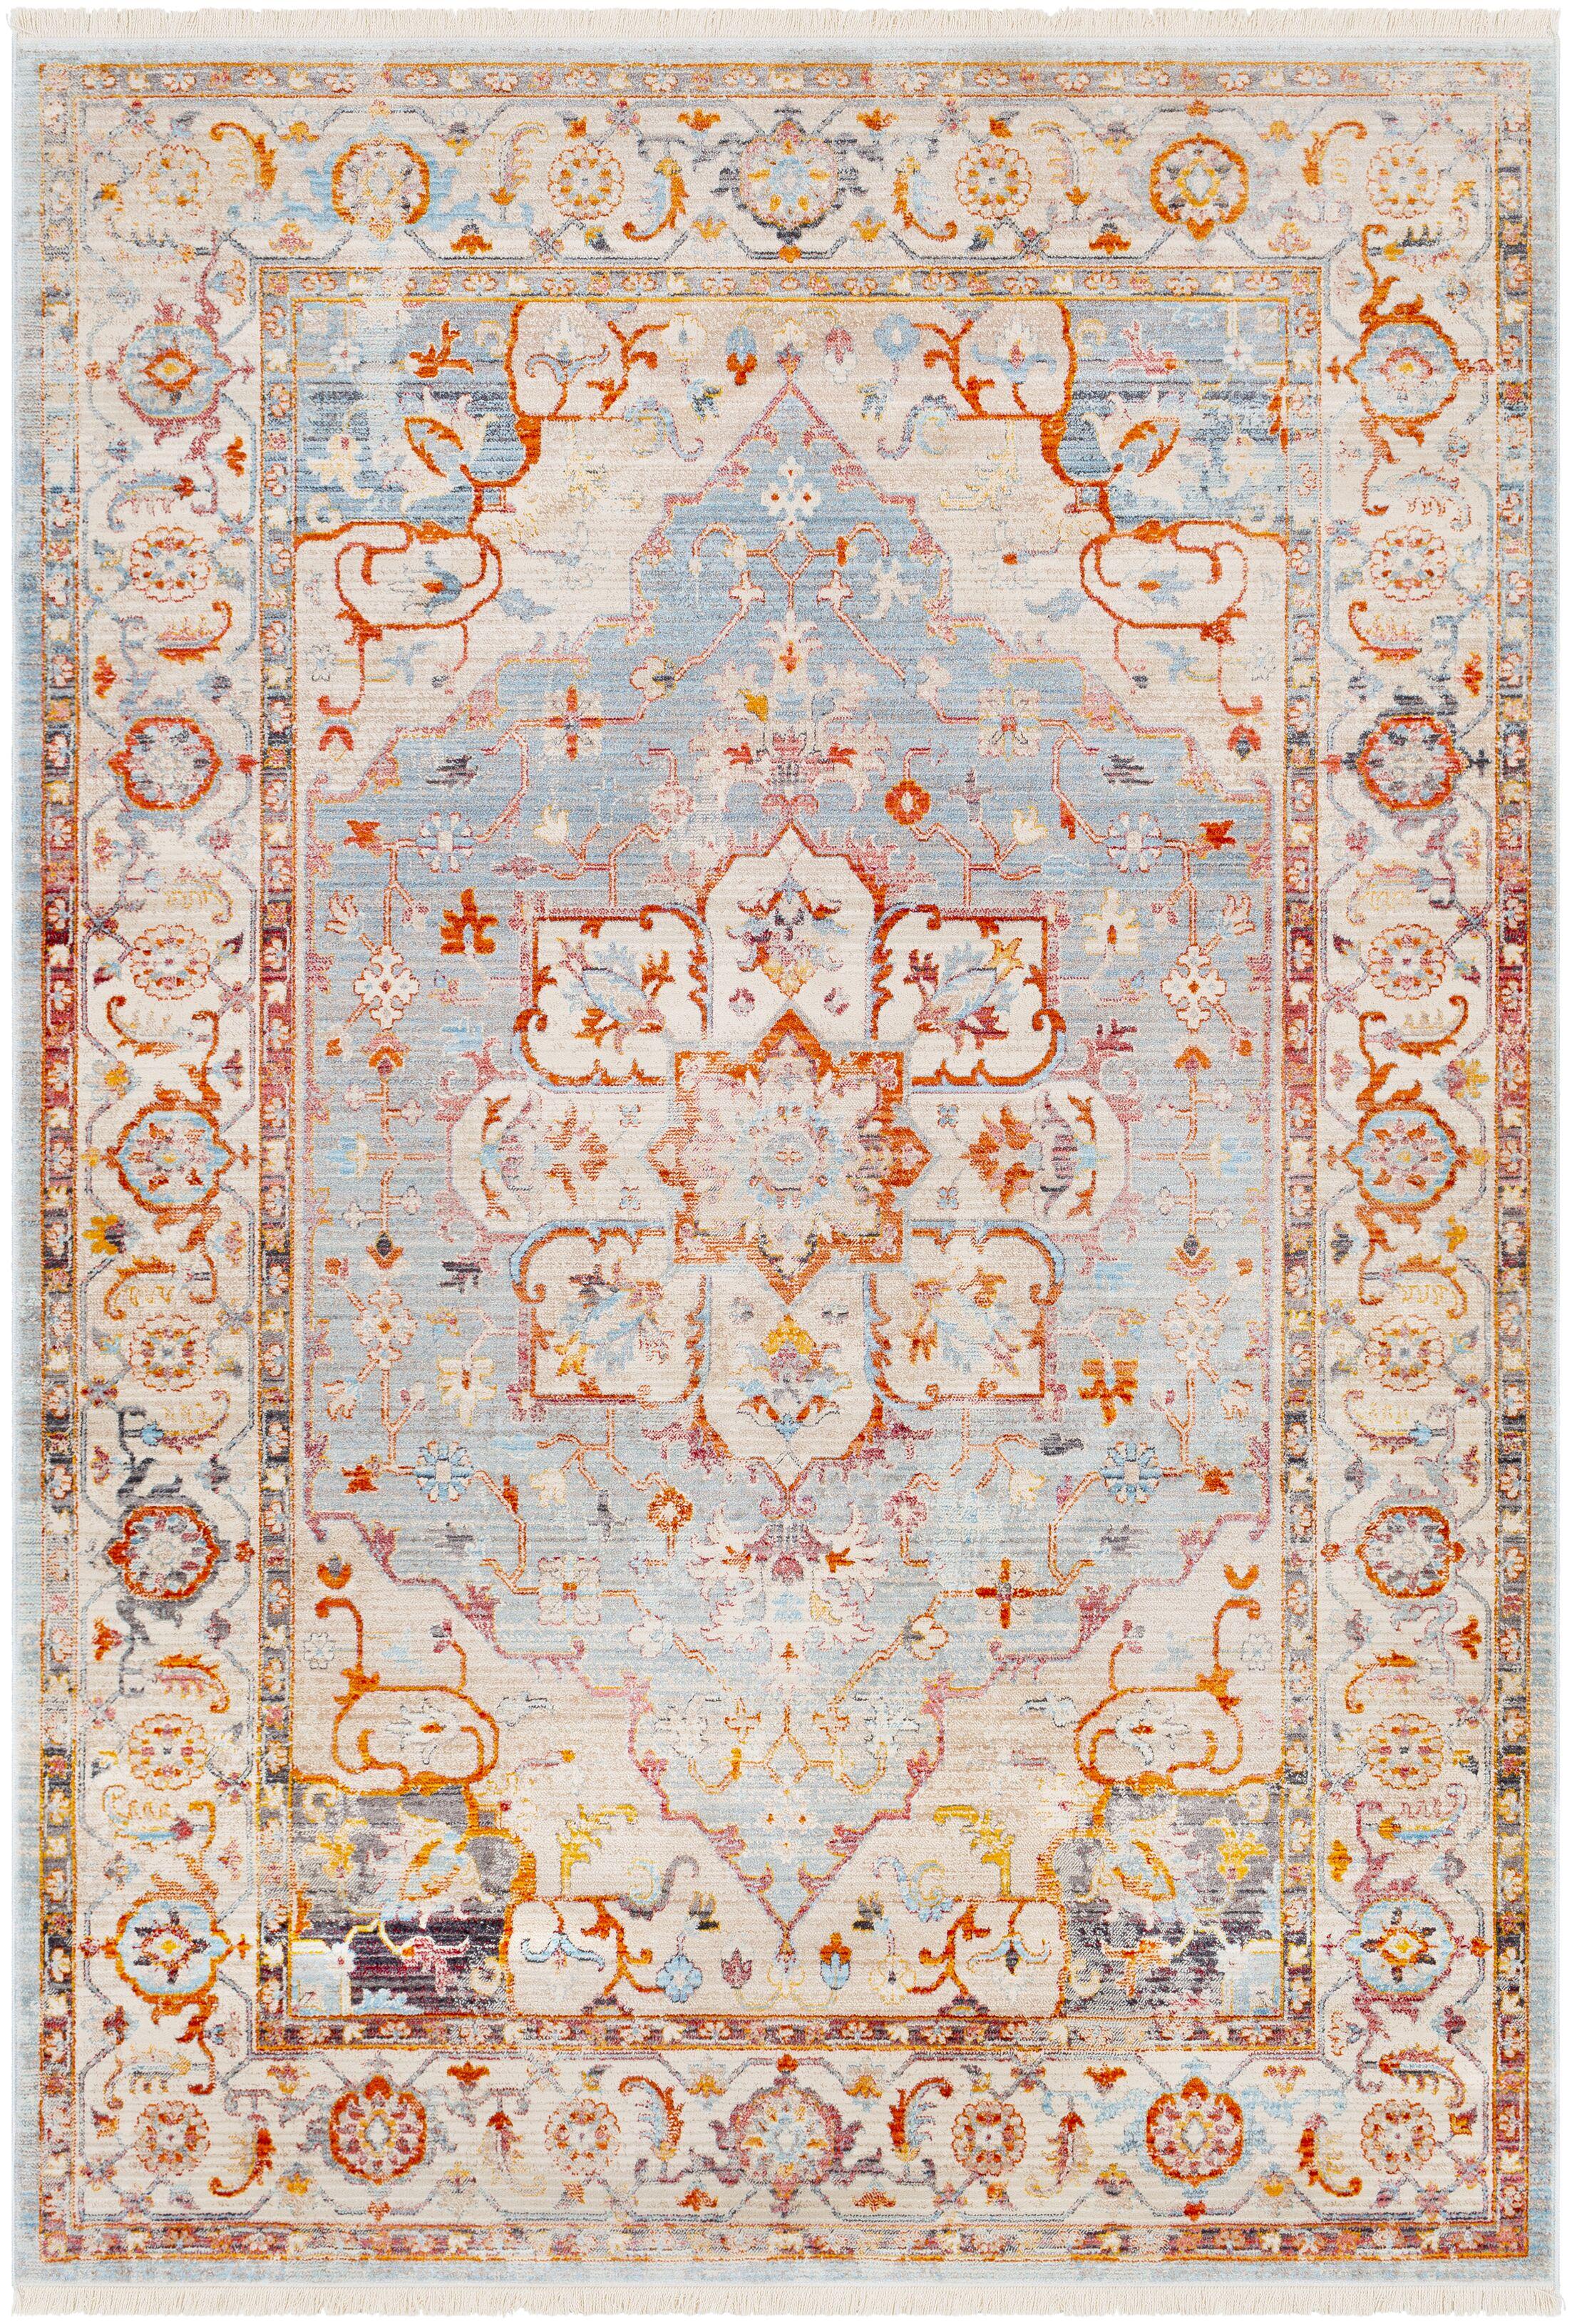 Mendelsohn Vintage Persian Traditional Blue/Beige Area Rug Rug Size: Rectangle 5' x 7'9